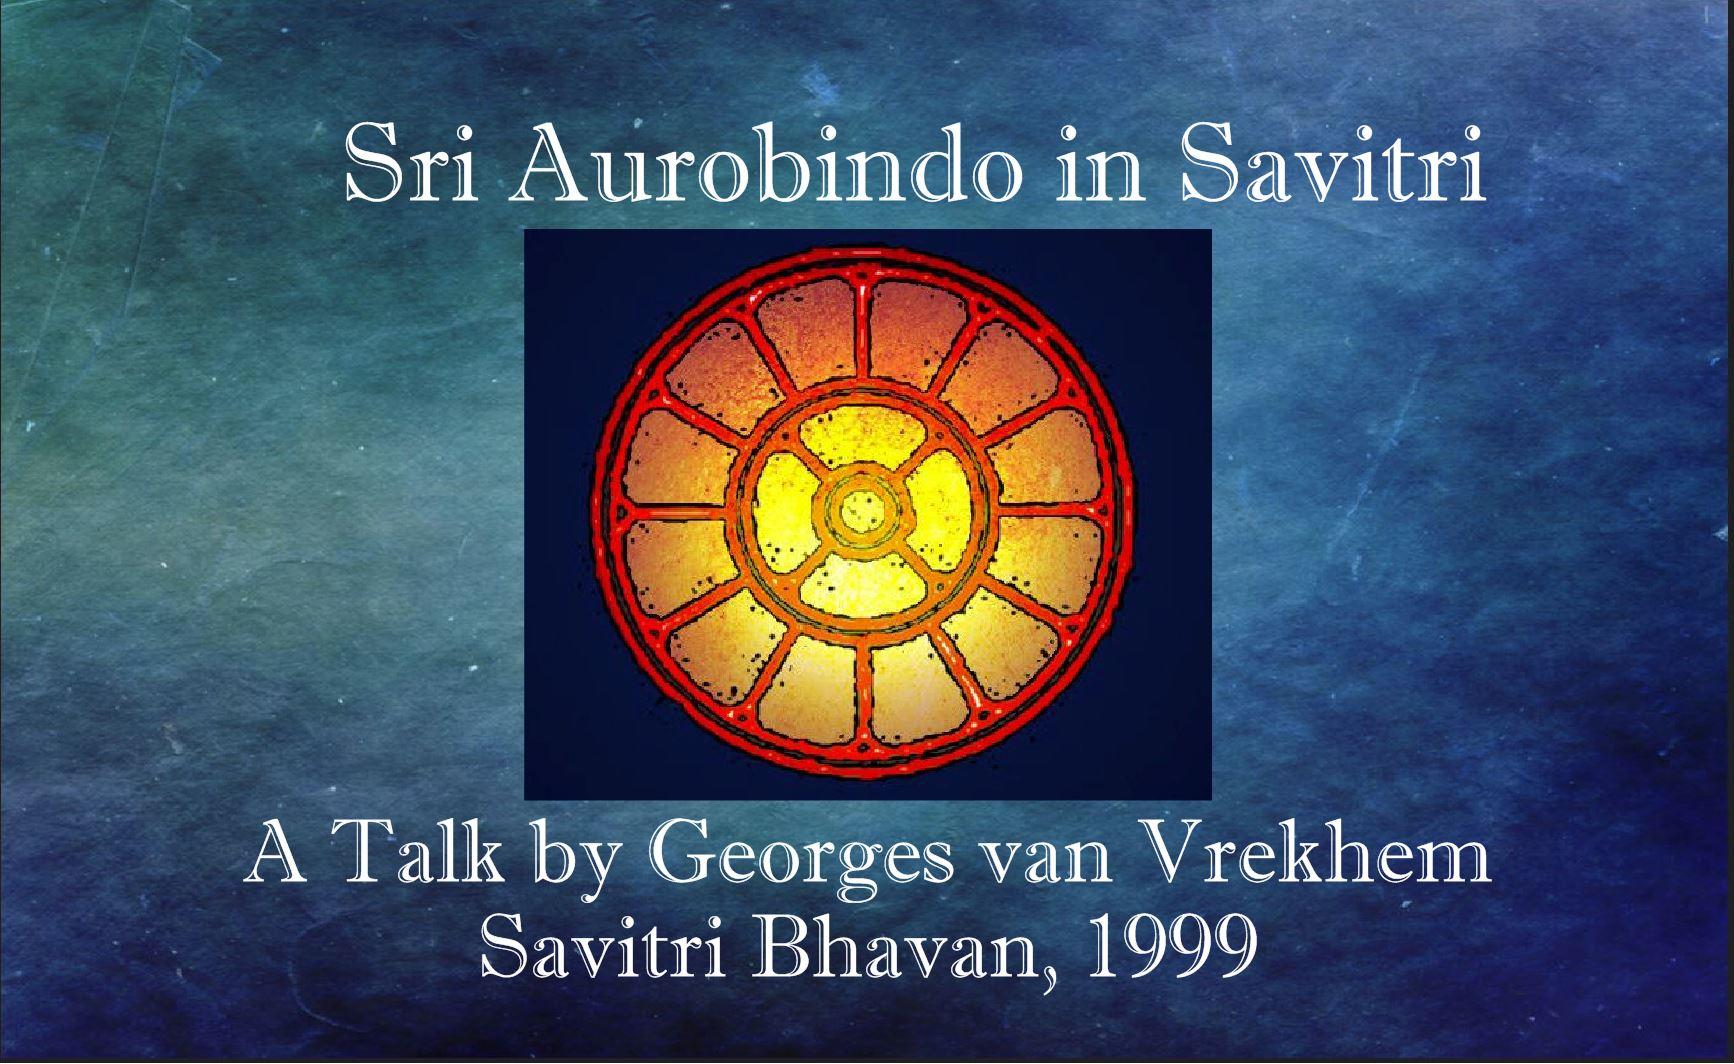 Sri Aurobindo in Savitri - a Talk by Georges van Vrekhem